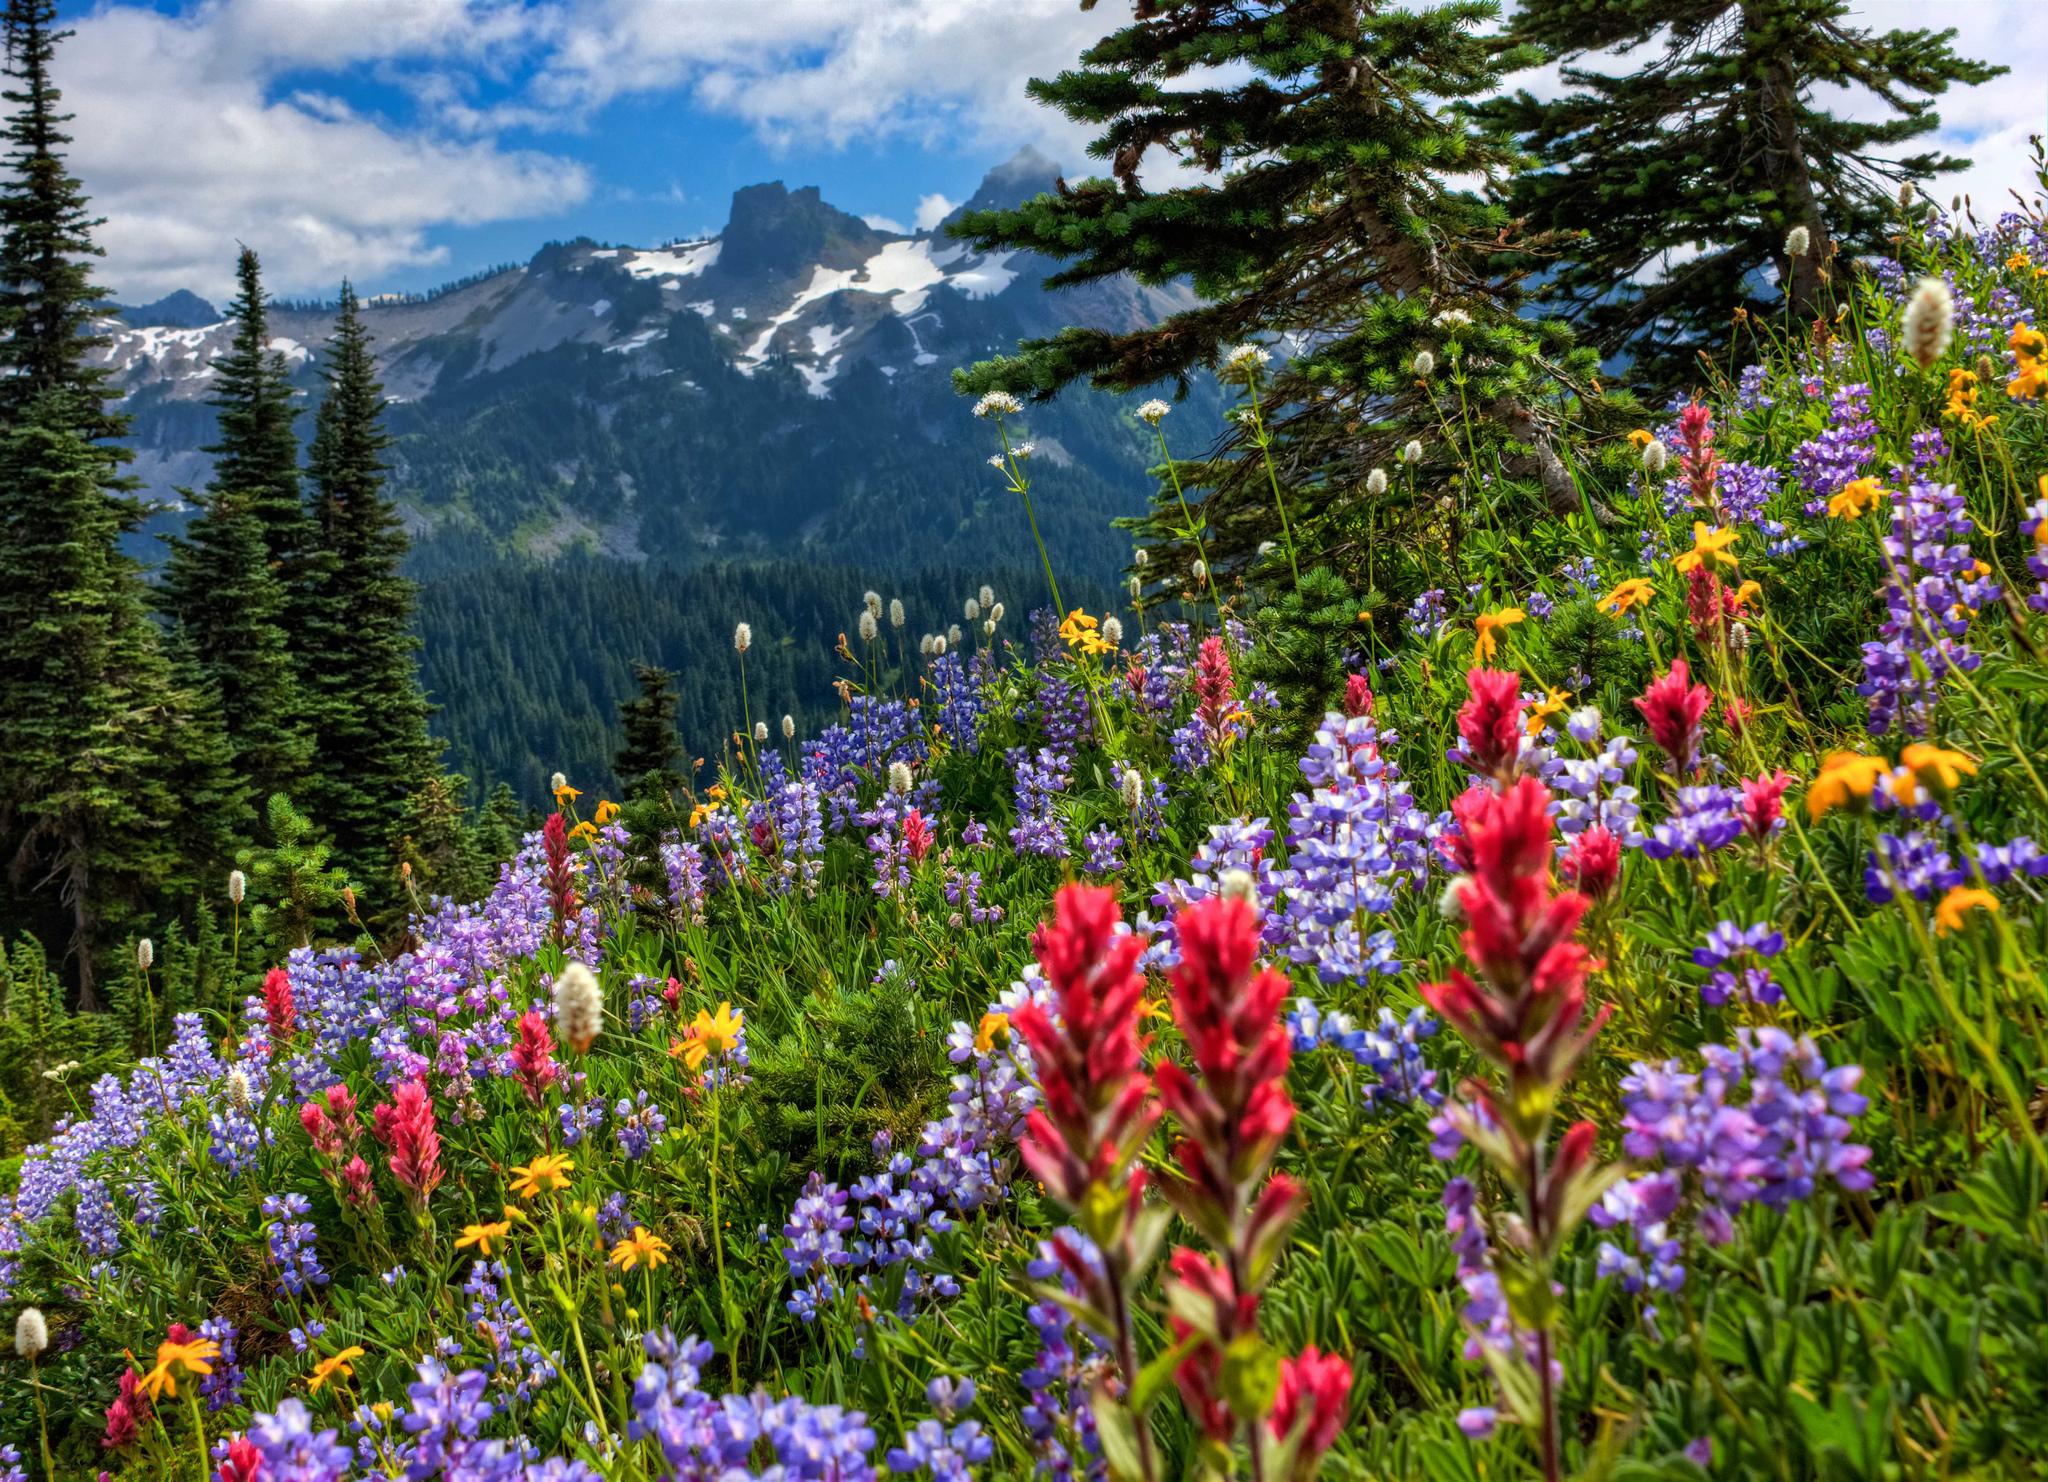 поляна цветы трава холмы горы glade flowers grass hills mountains  № 1829182 загрузить